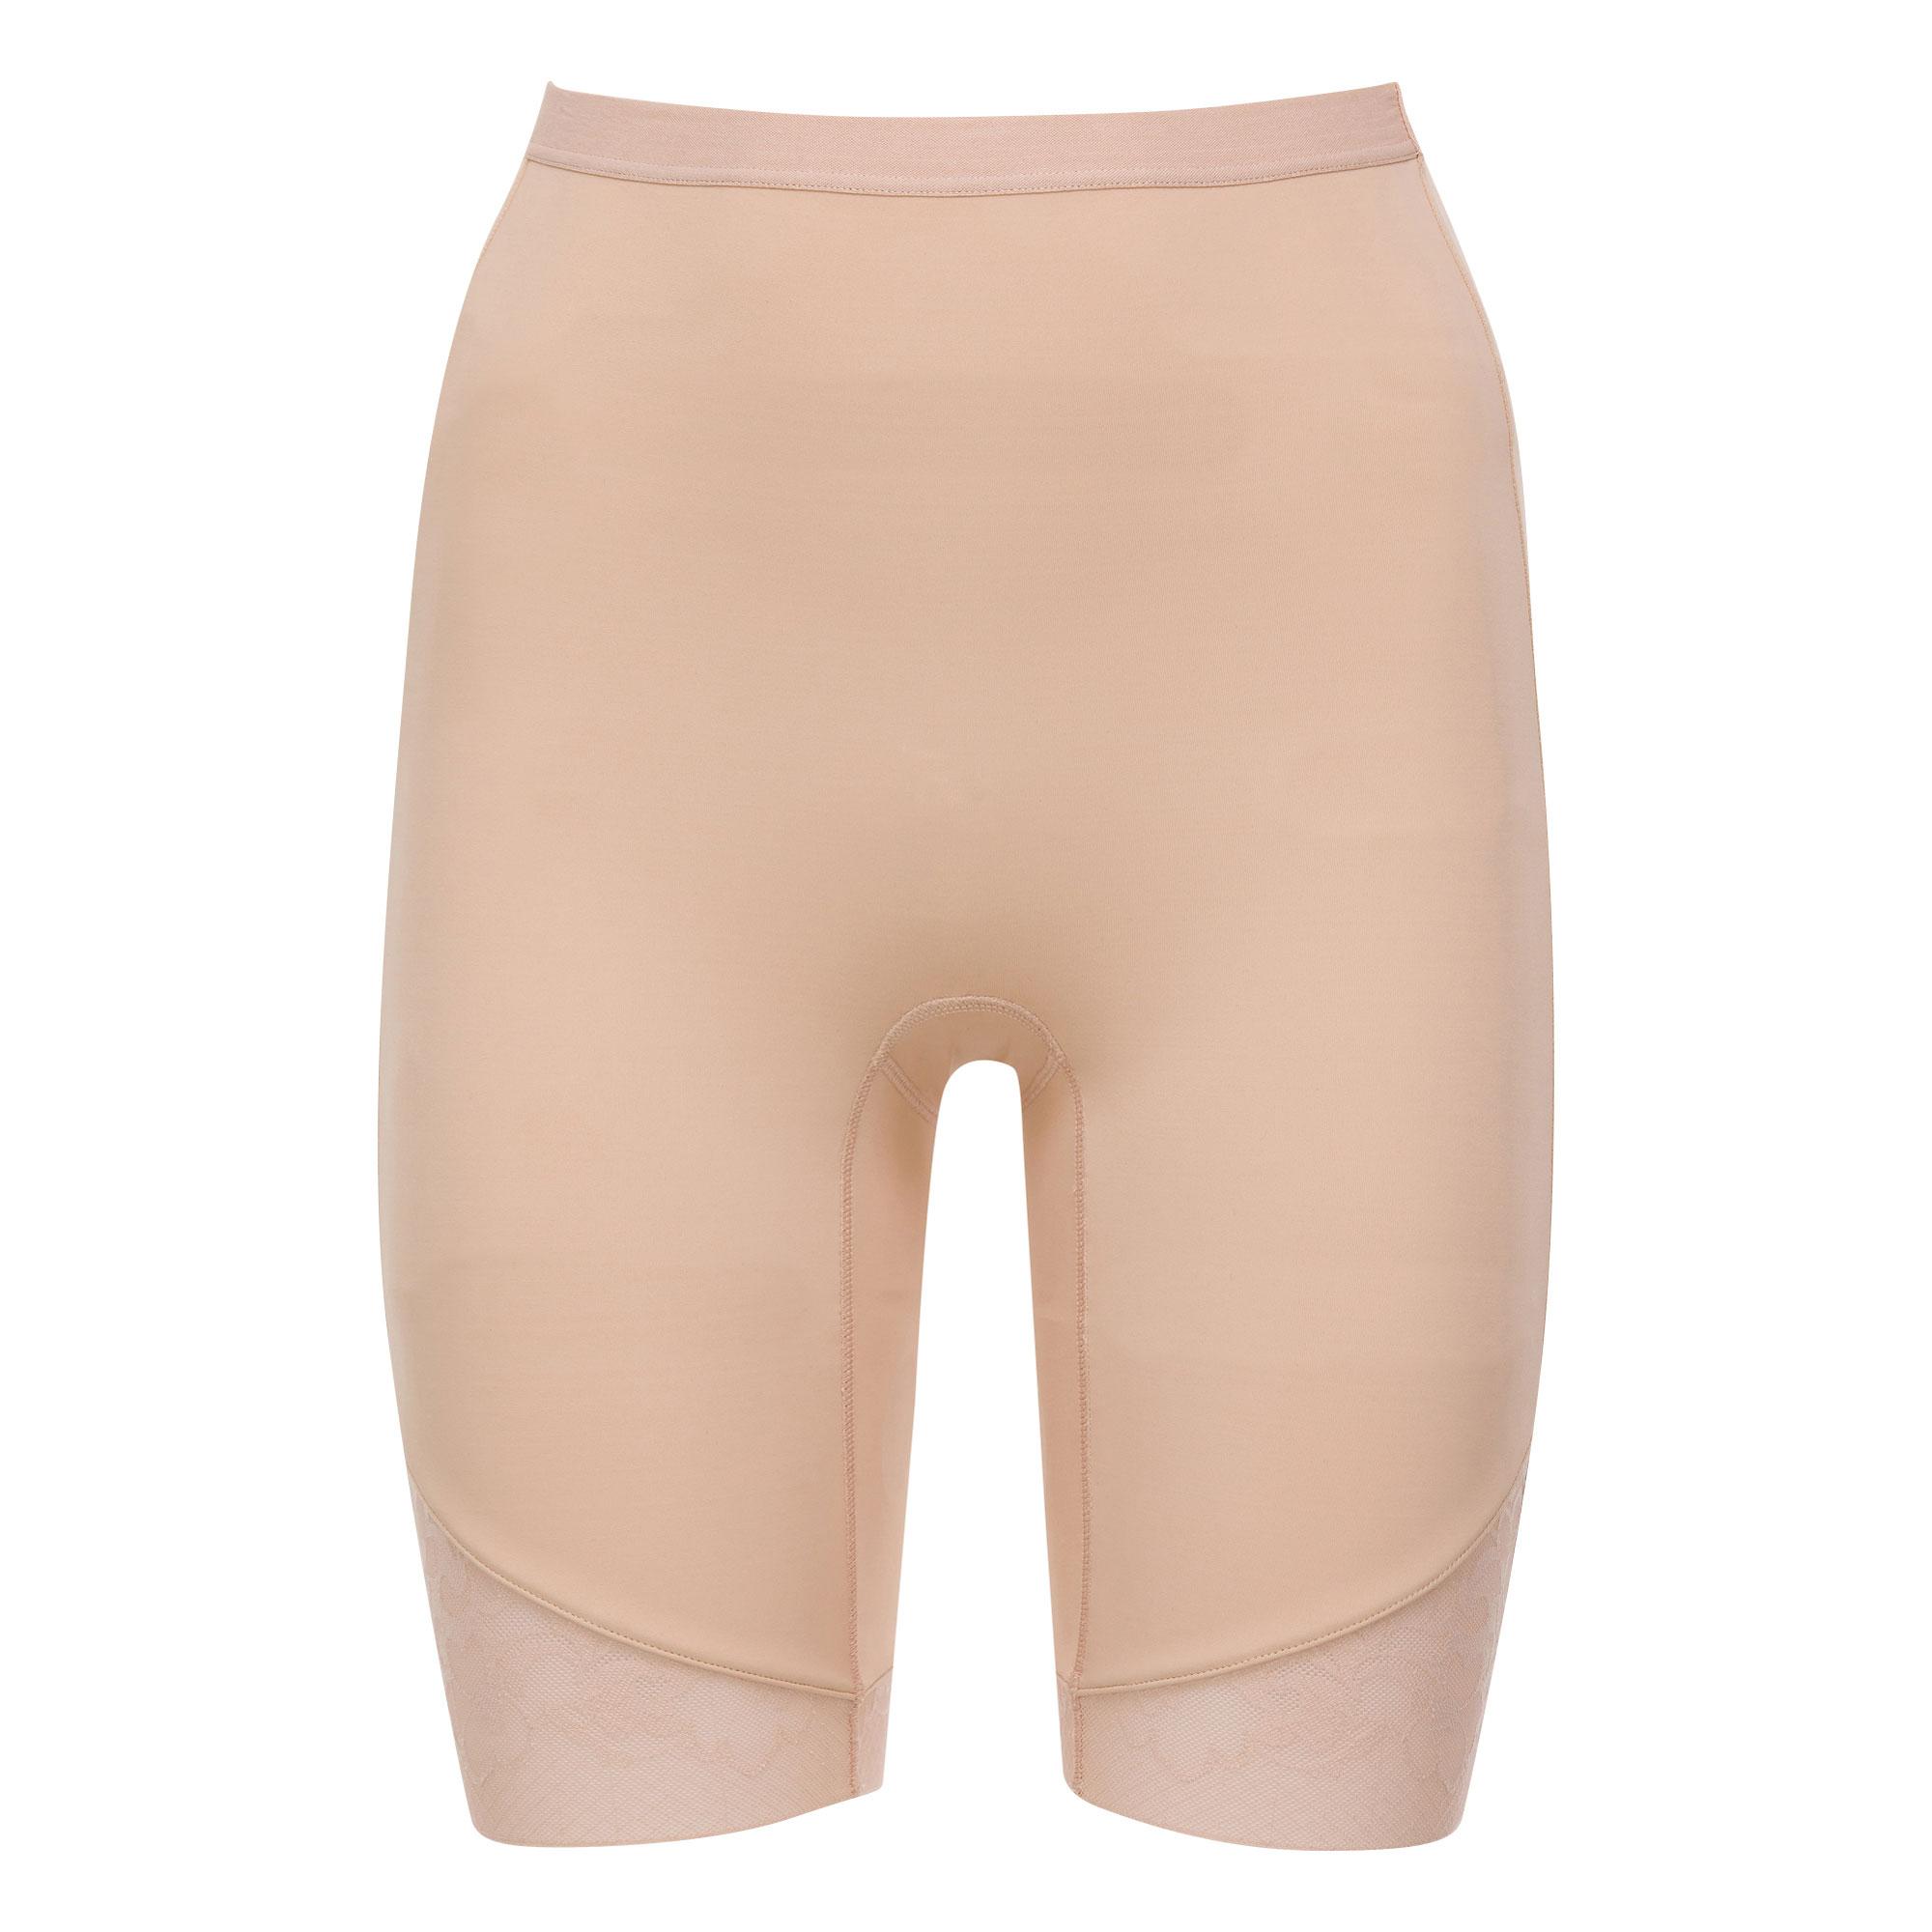 Beige thigh slimmer - Expert in Silhouette-PLAYTEX